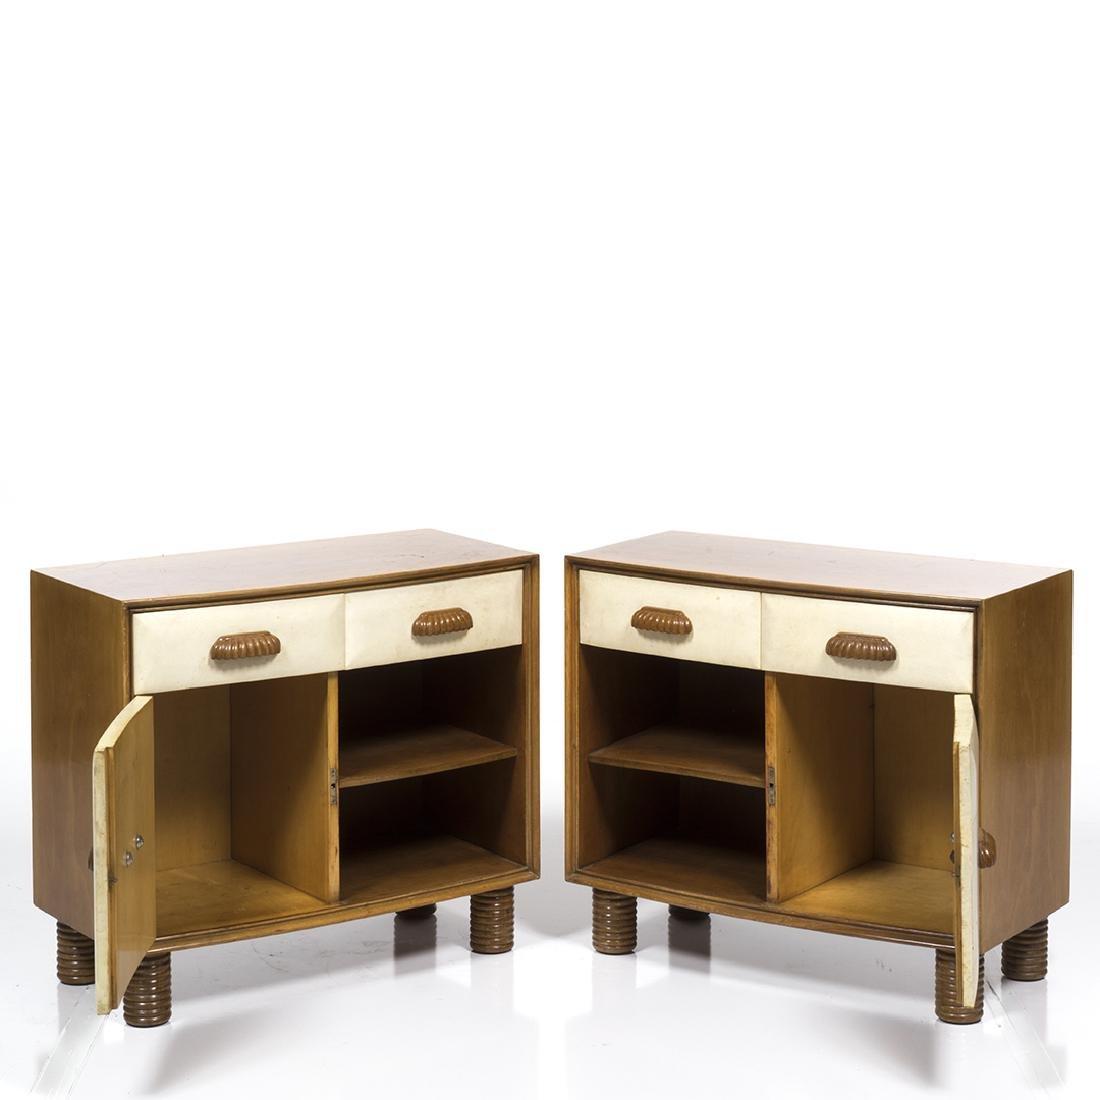 Osvaldo Borsani Bedside Cabinets (2) - 2